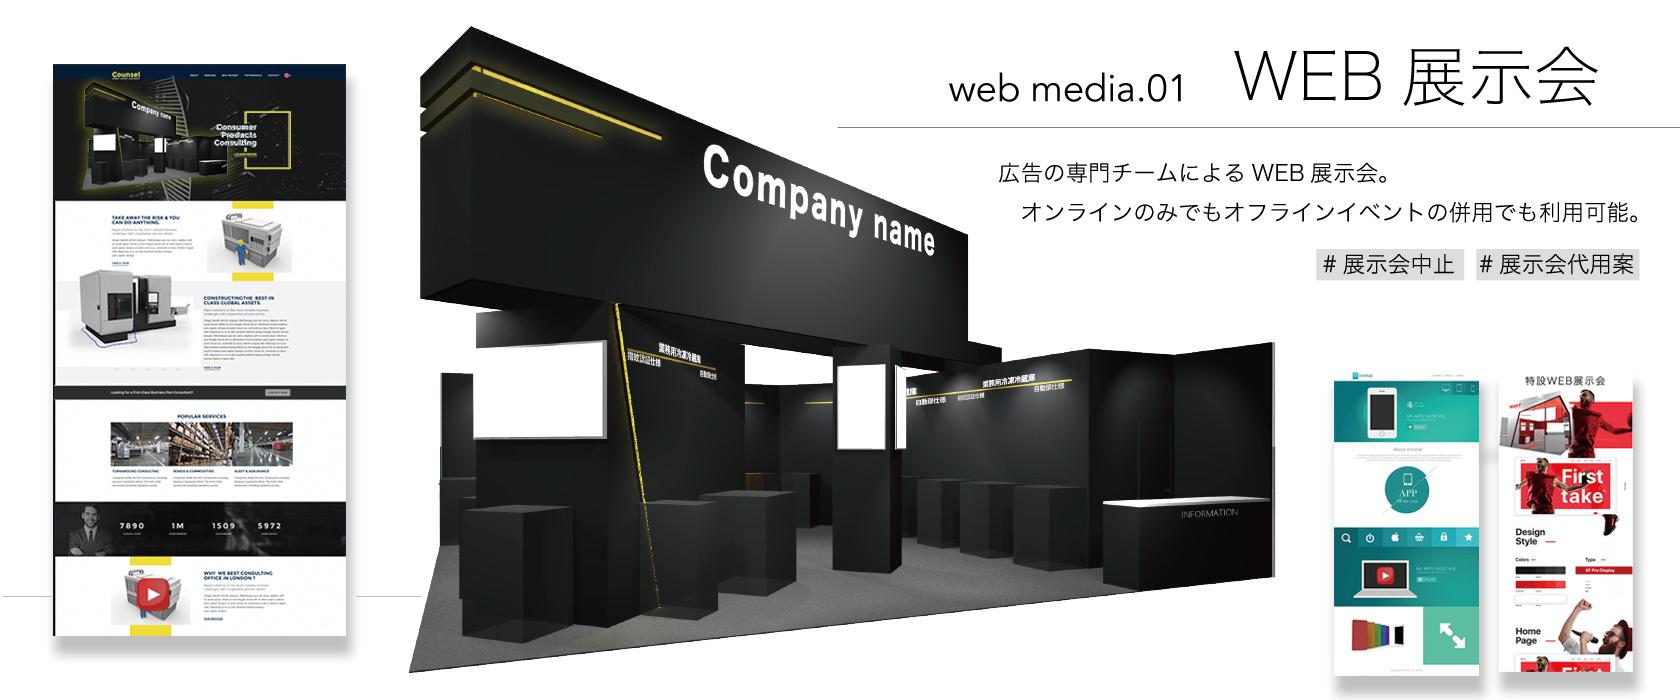 WEB展示会を開催